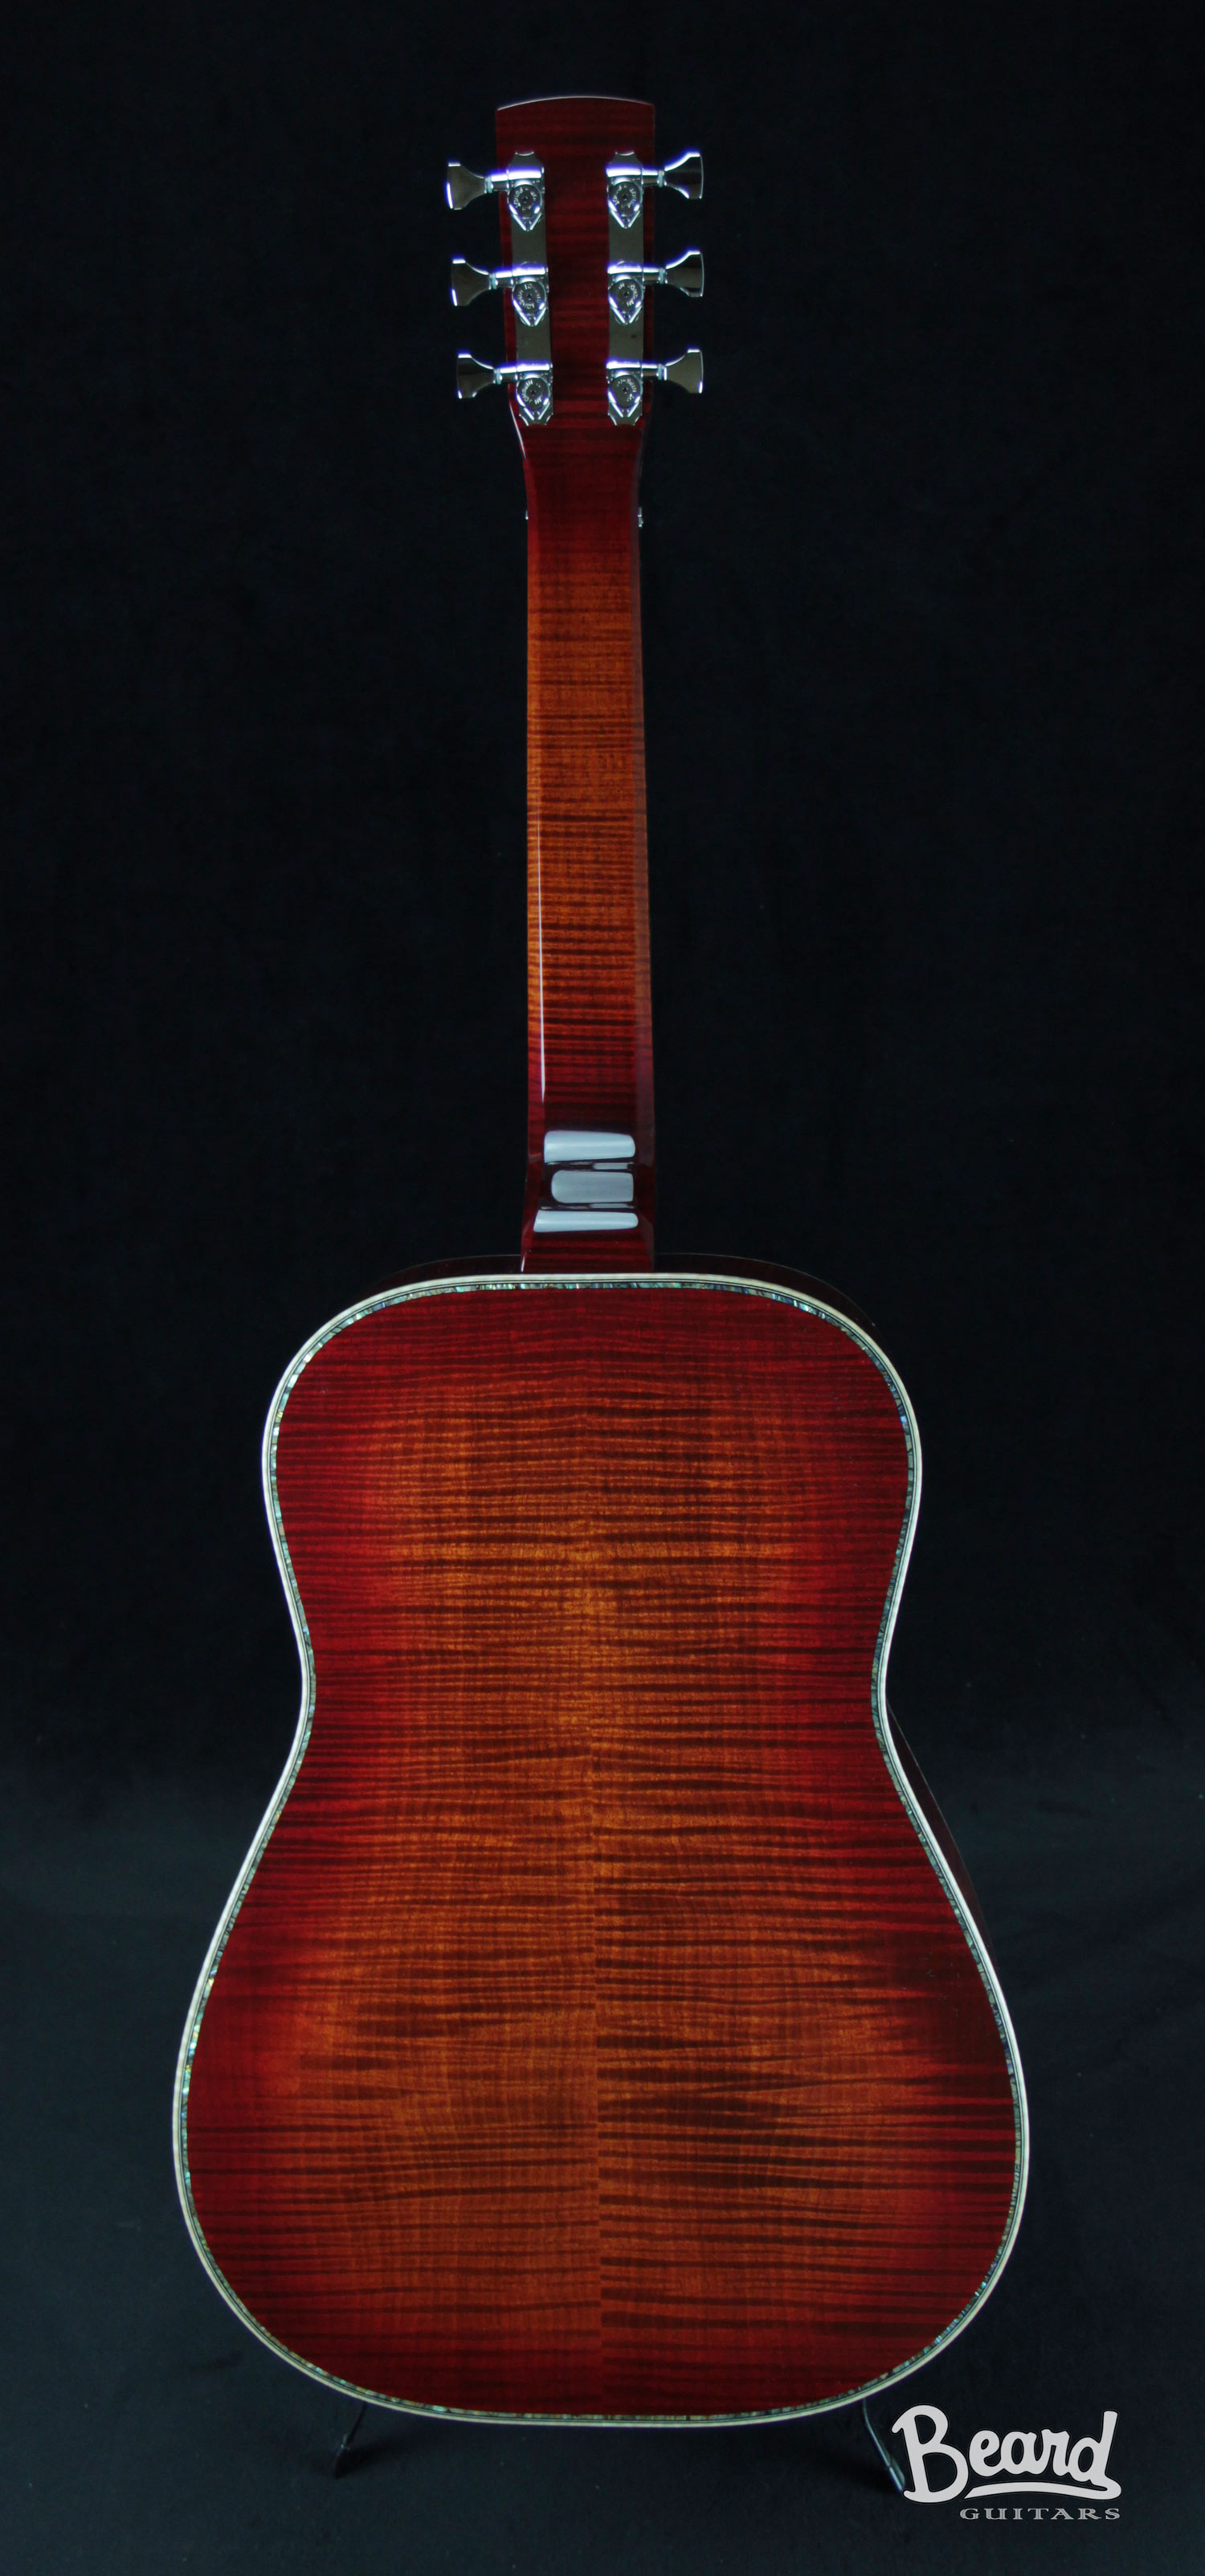 E-Model-Maple-Cherry-Fire-Burst-inlay-with-hiphsot-FB.jpg